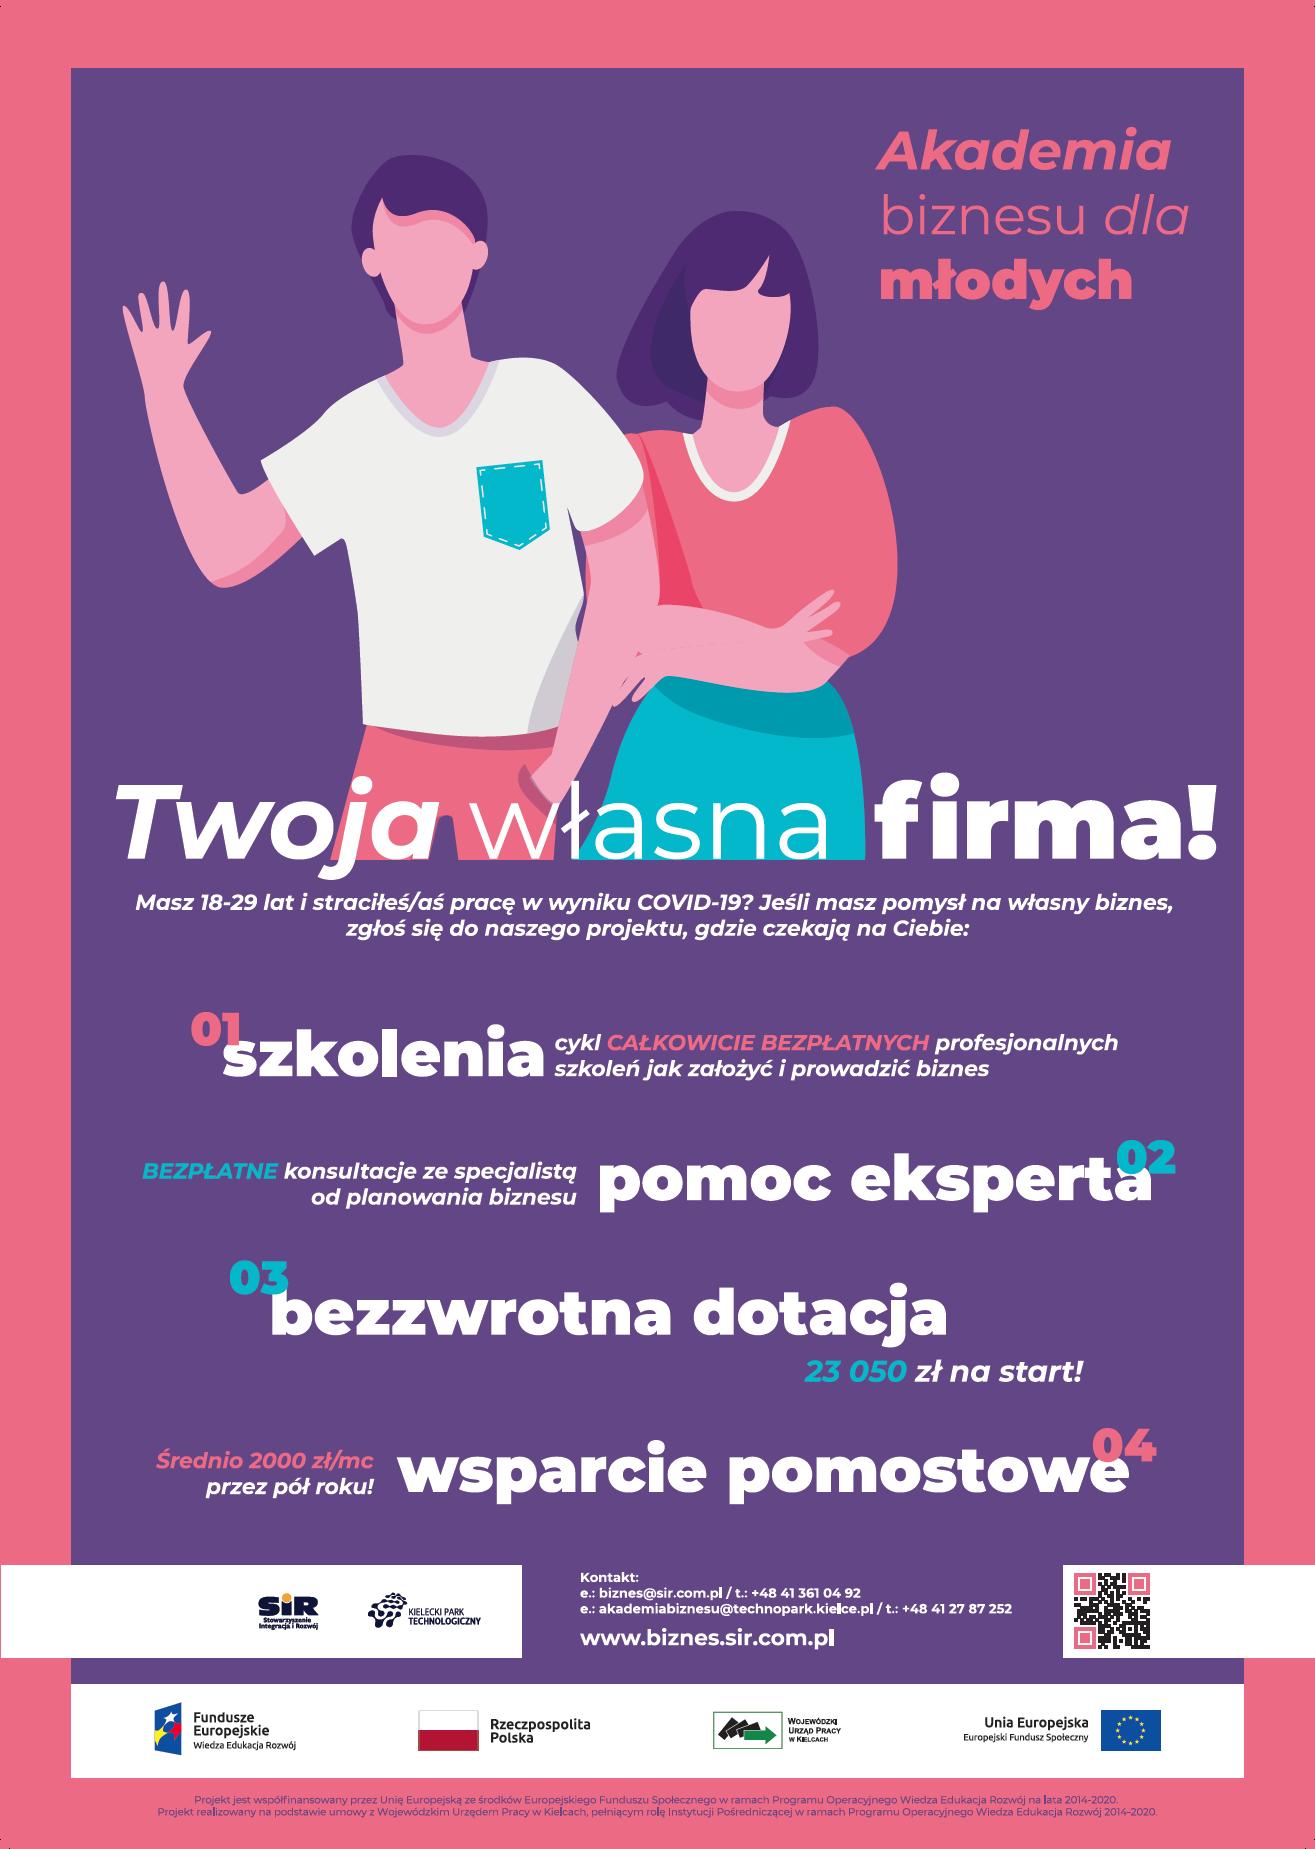 bezzwrotna_dotacja.png